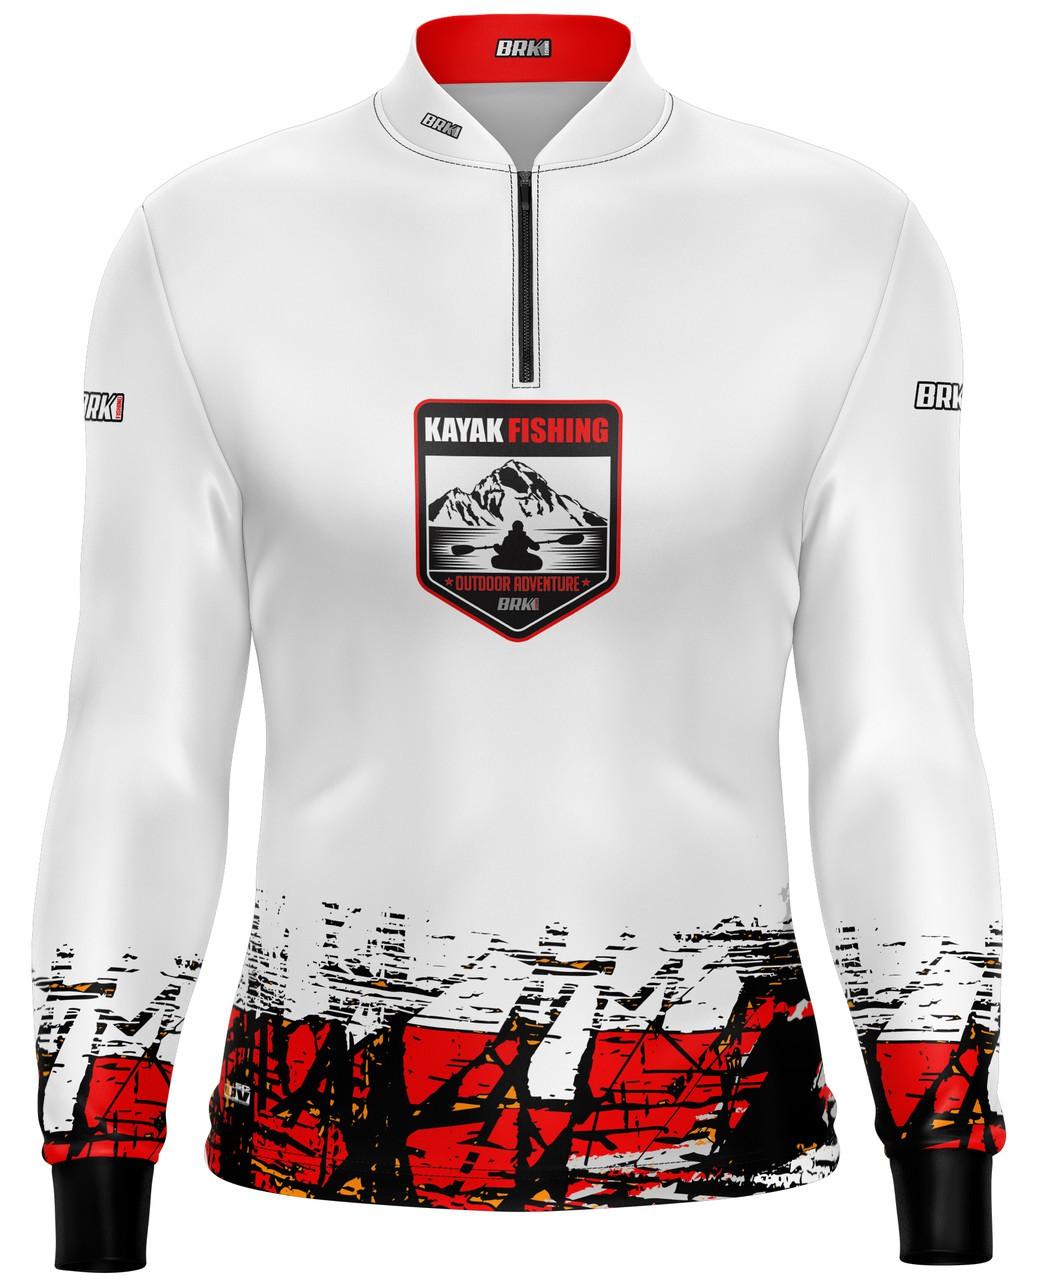 Camisa de Pesca Brk Kayak Fishing Outdoor Branca com Fpu 50+